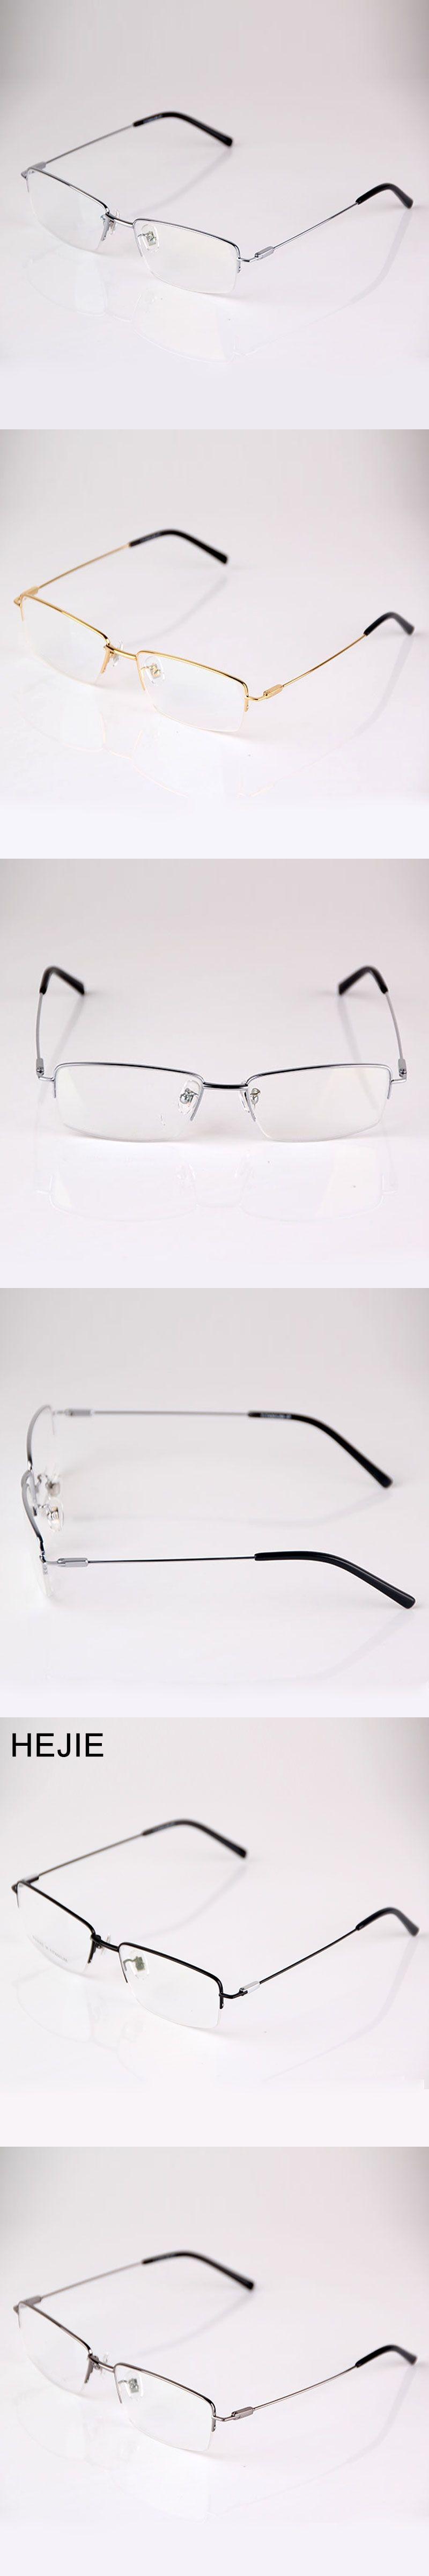 12df8b873183 HEJIE Grade Men Pure Titanium Eyeglasses Frames Brand Half Rim Clear Lens Optical  Glasses Frames For